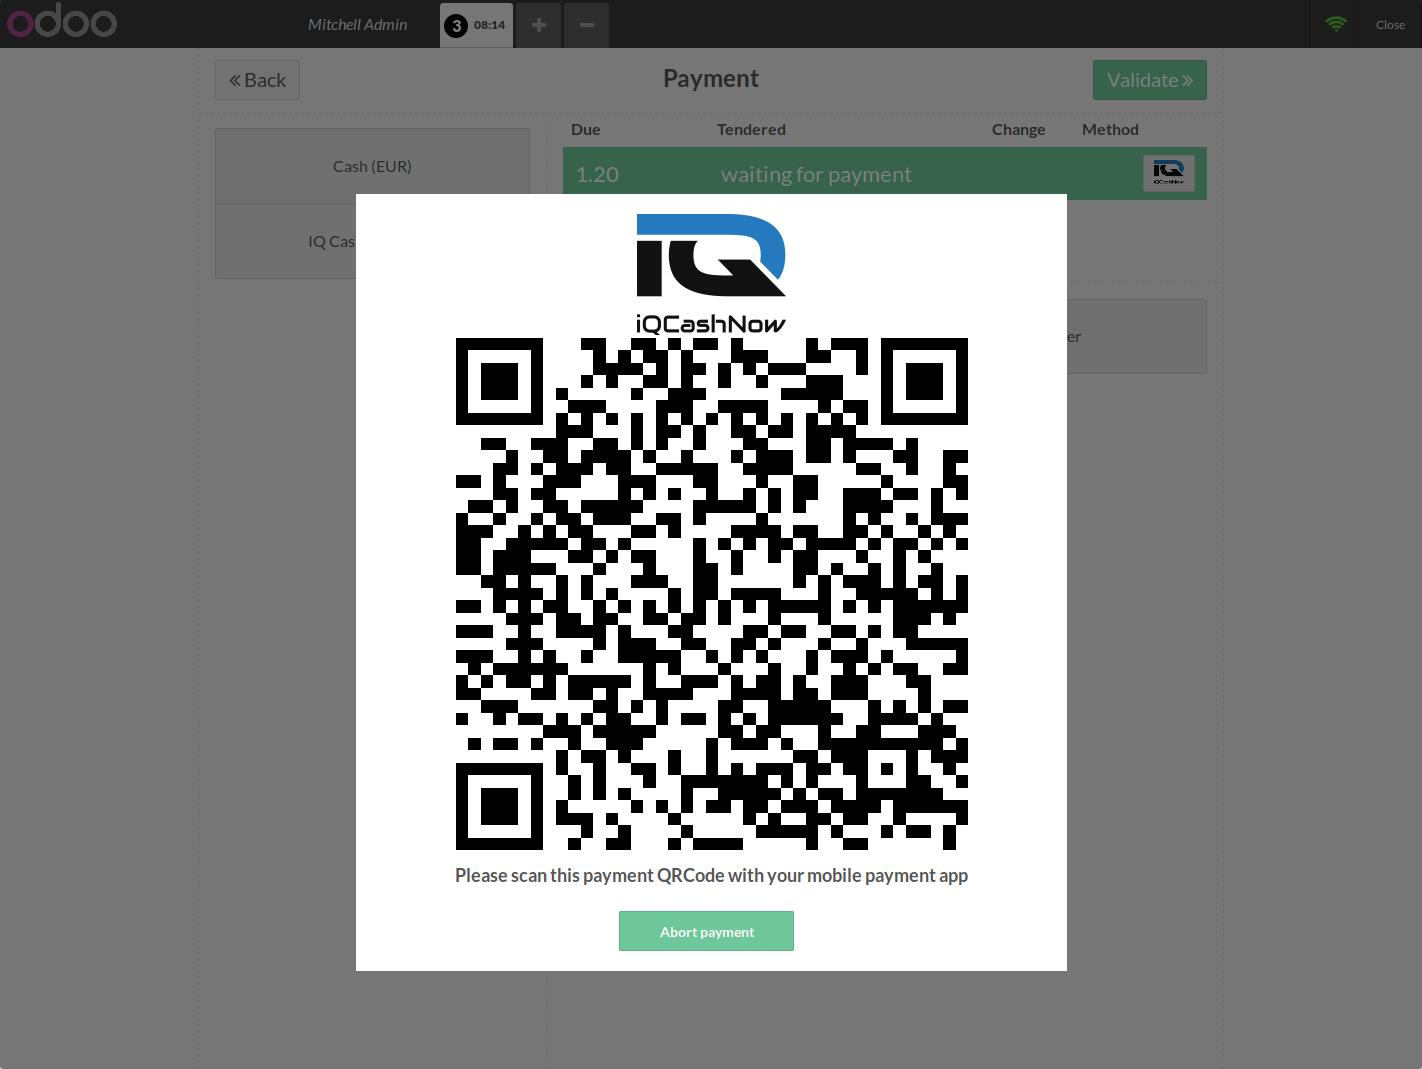 POS Payment screen